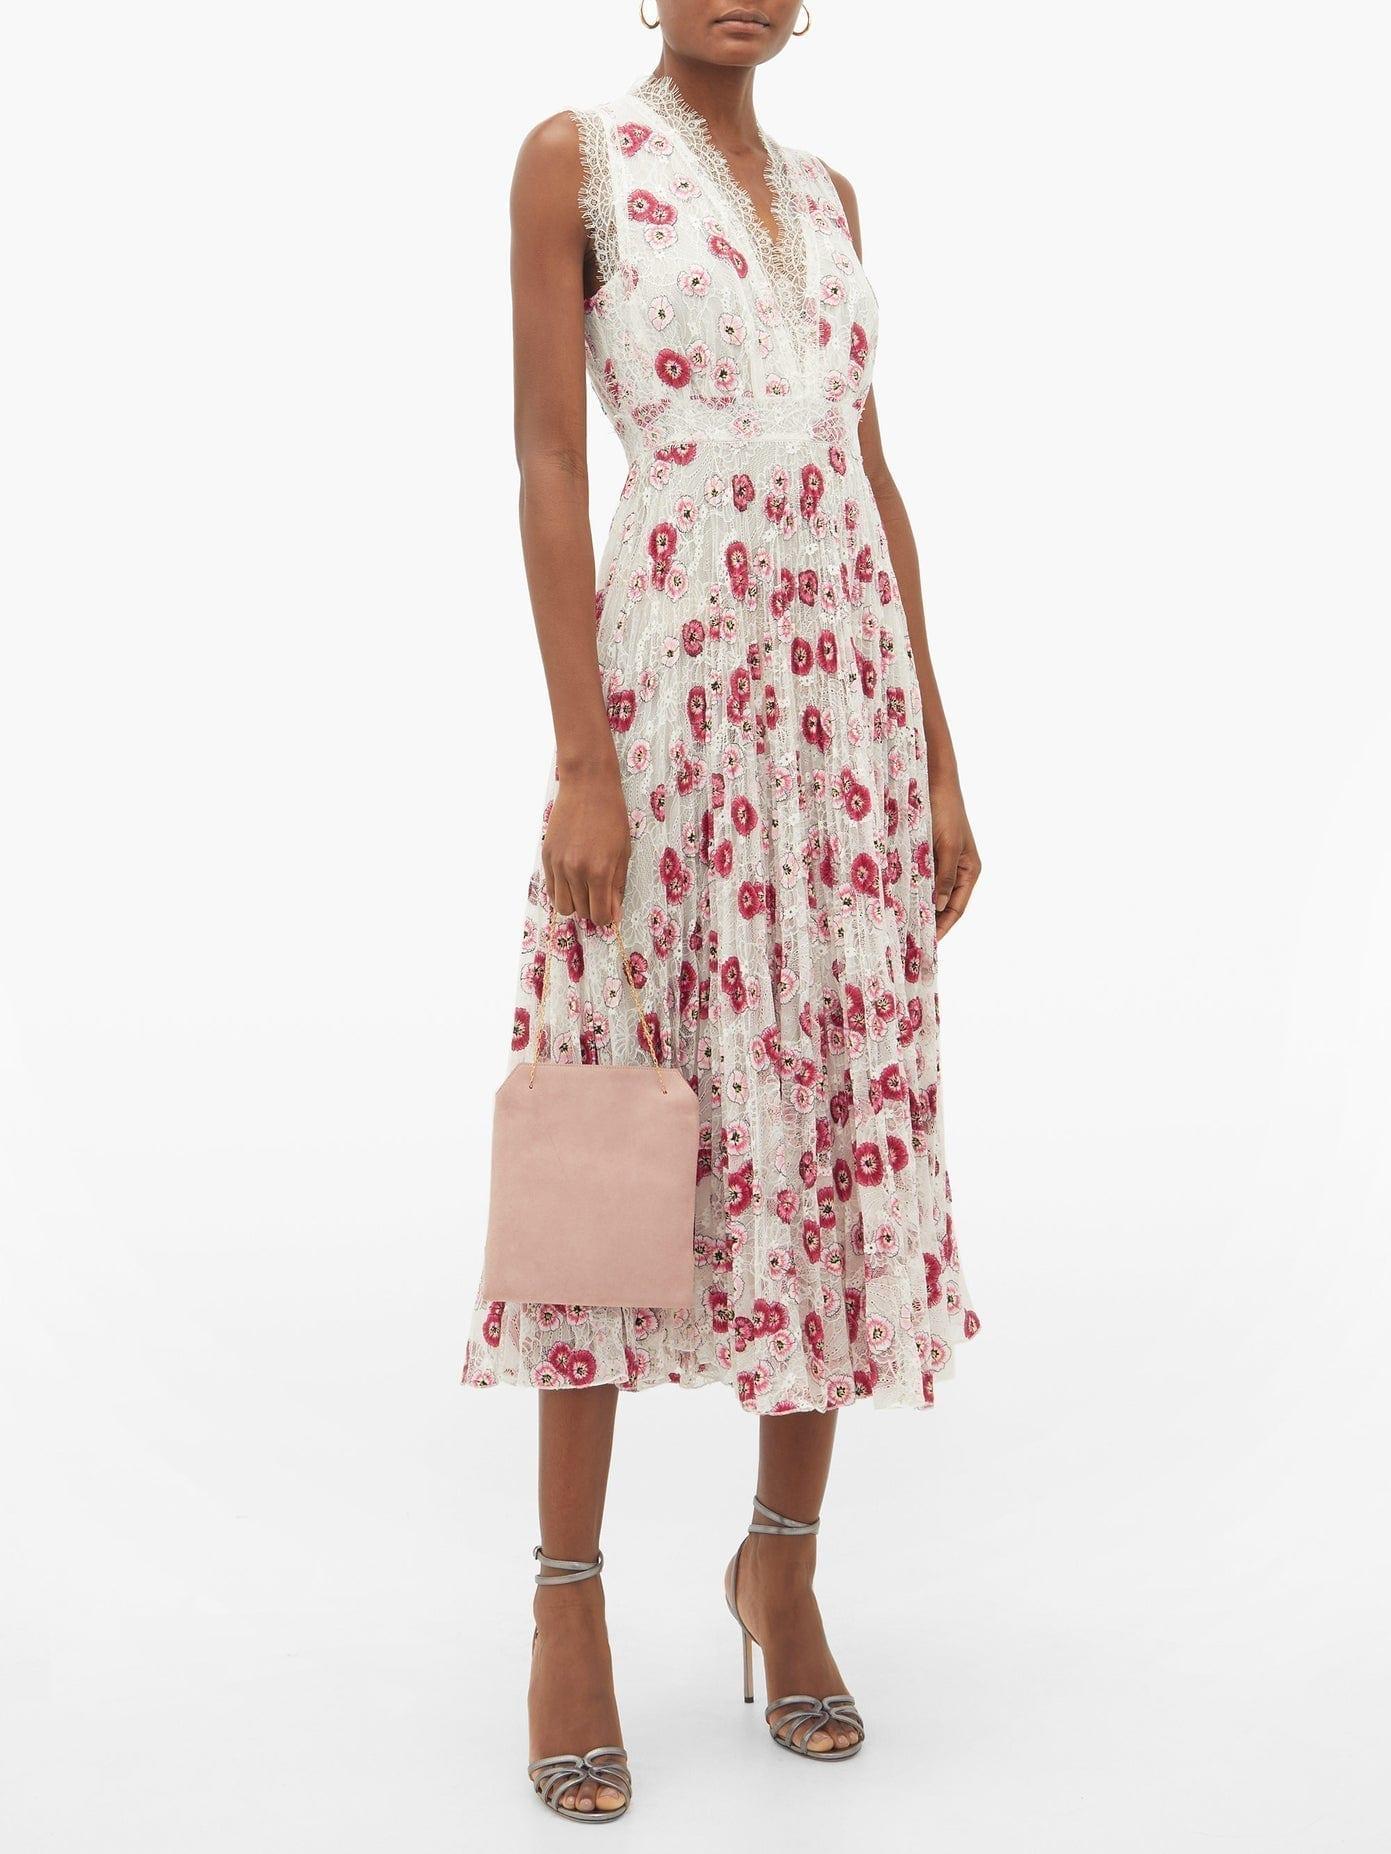 GIAMBATTISTA VALLI Floral-embroidered Chantilly-lace Midi Dress